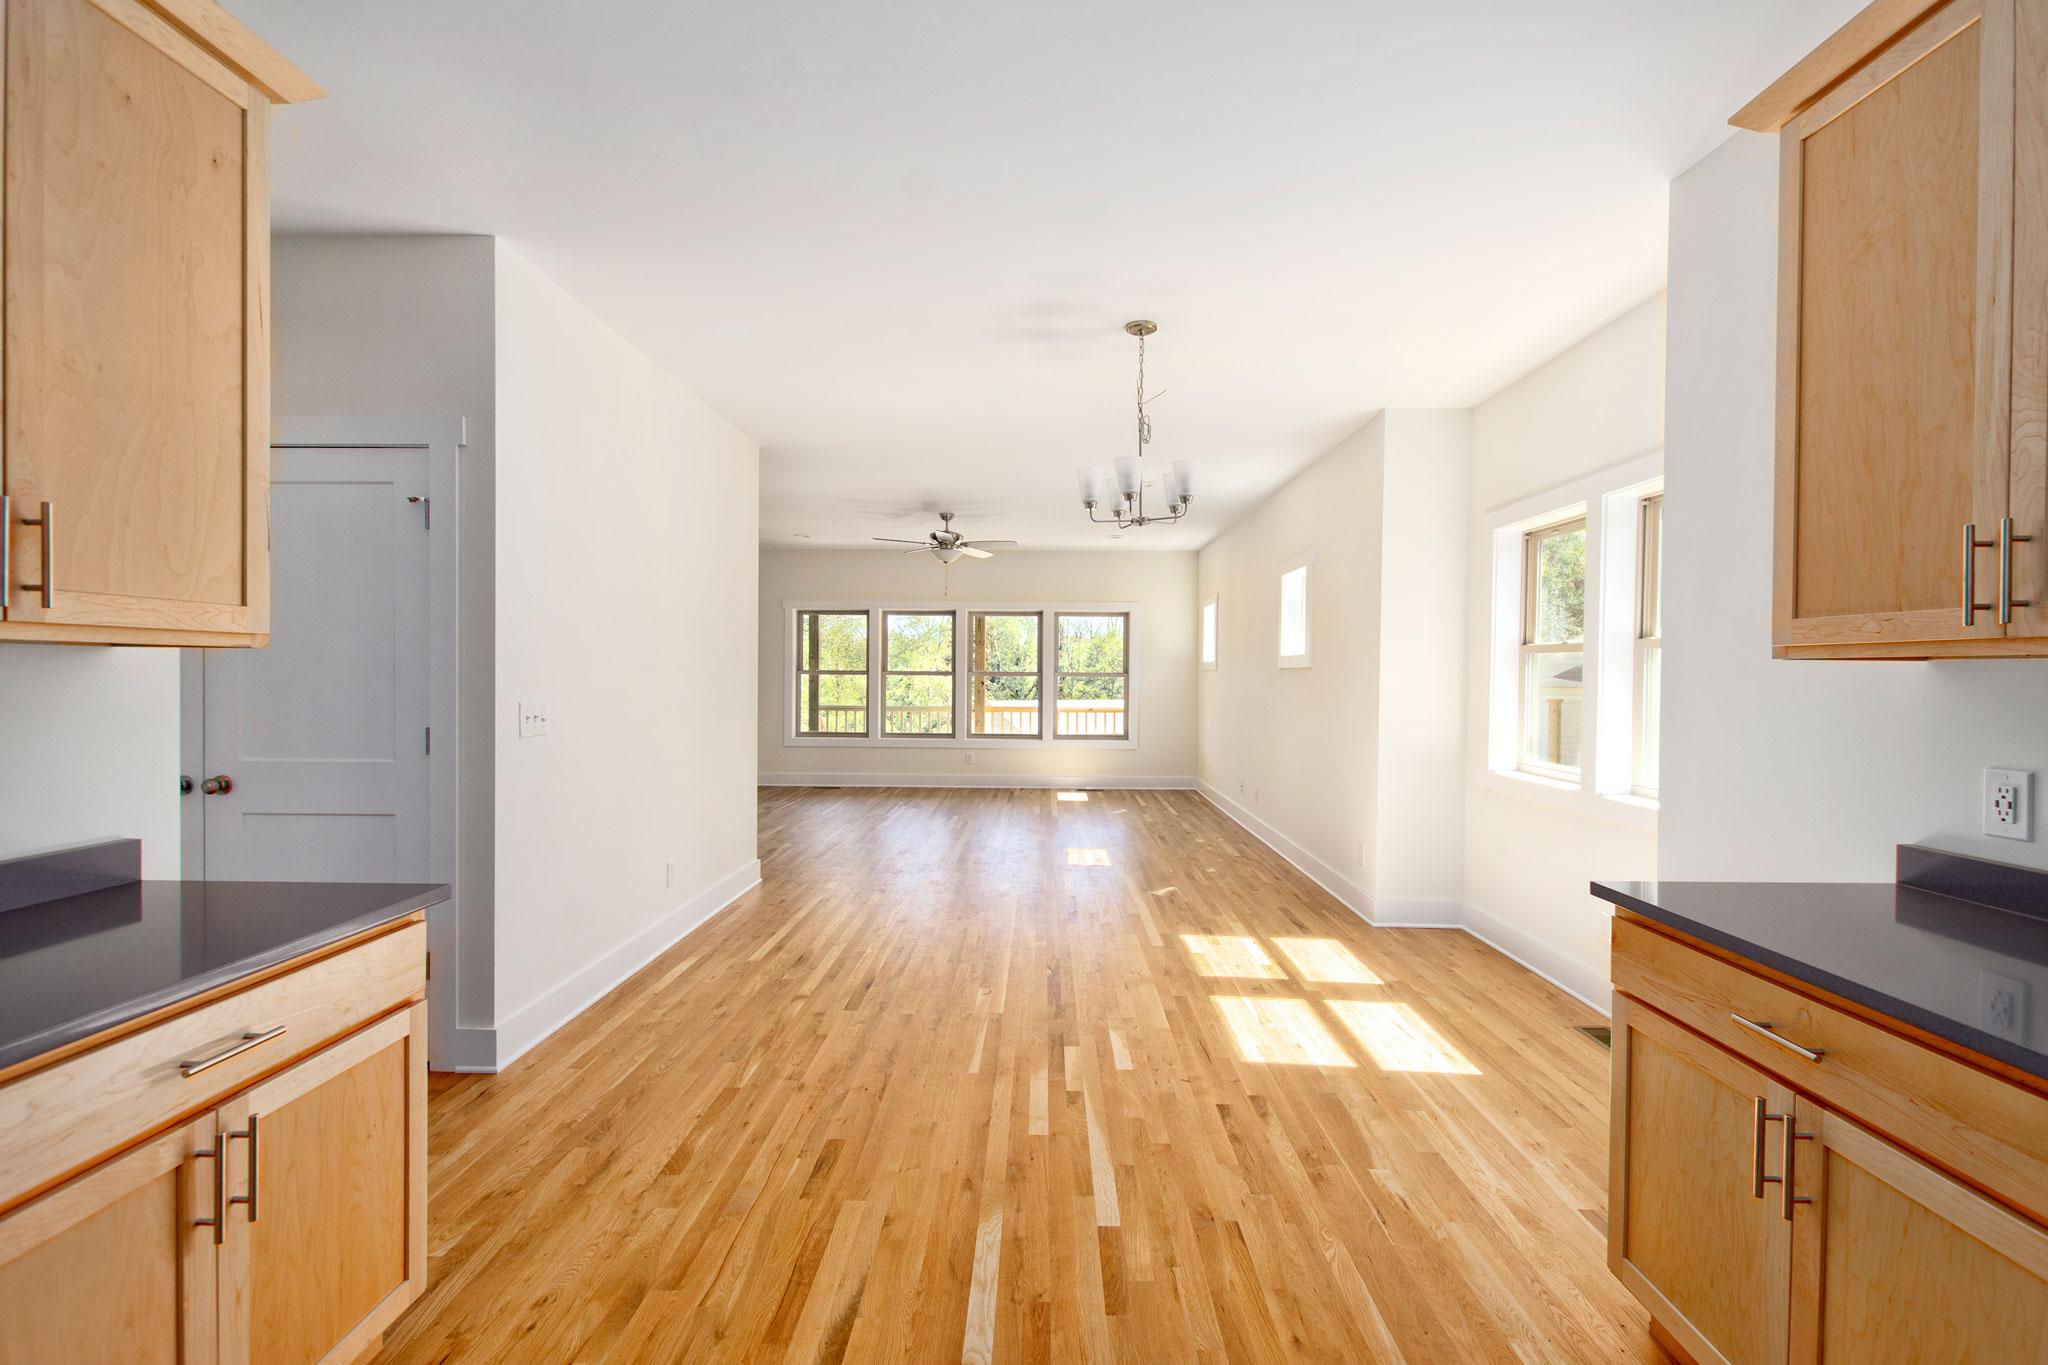 09 Open Floorplan.jpg